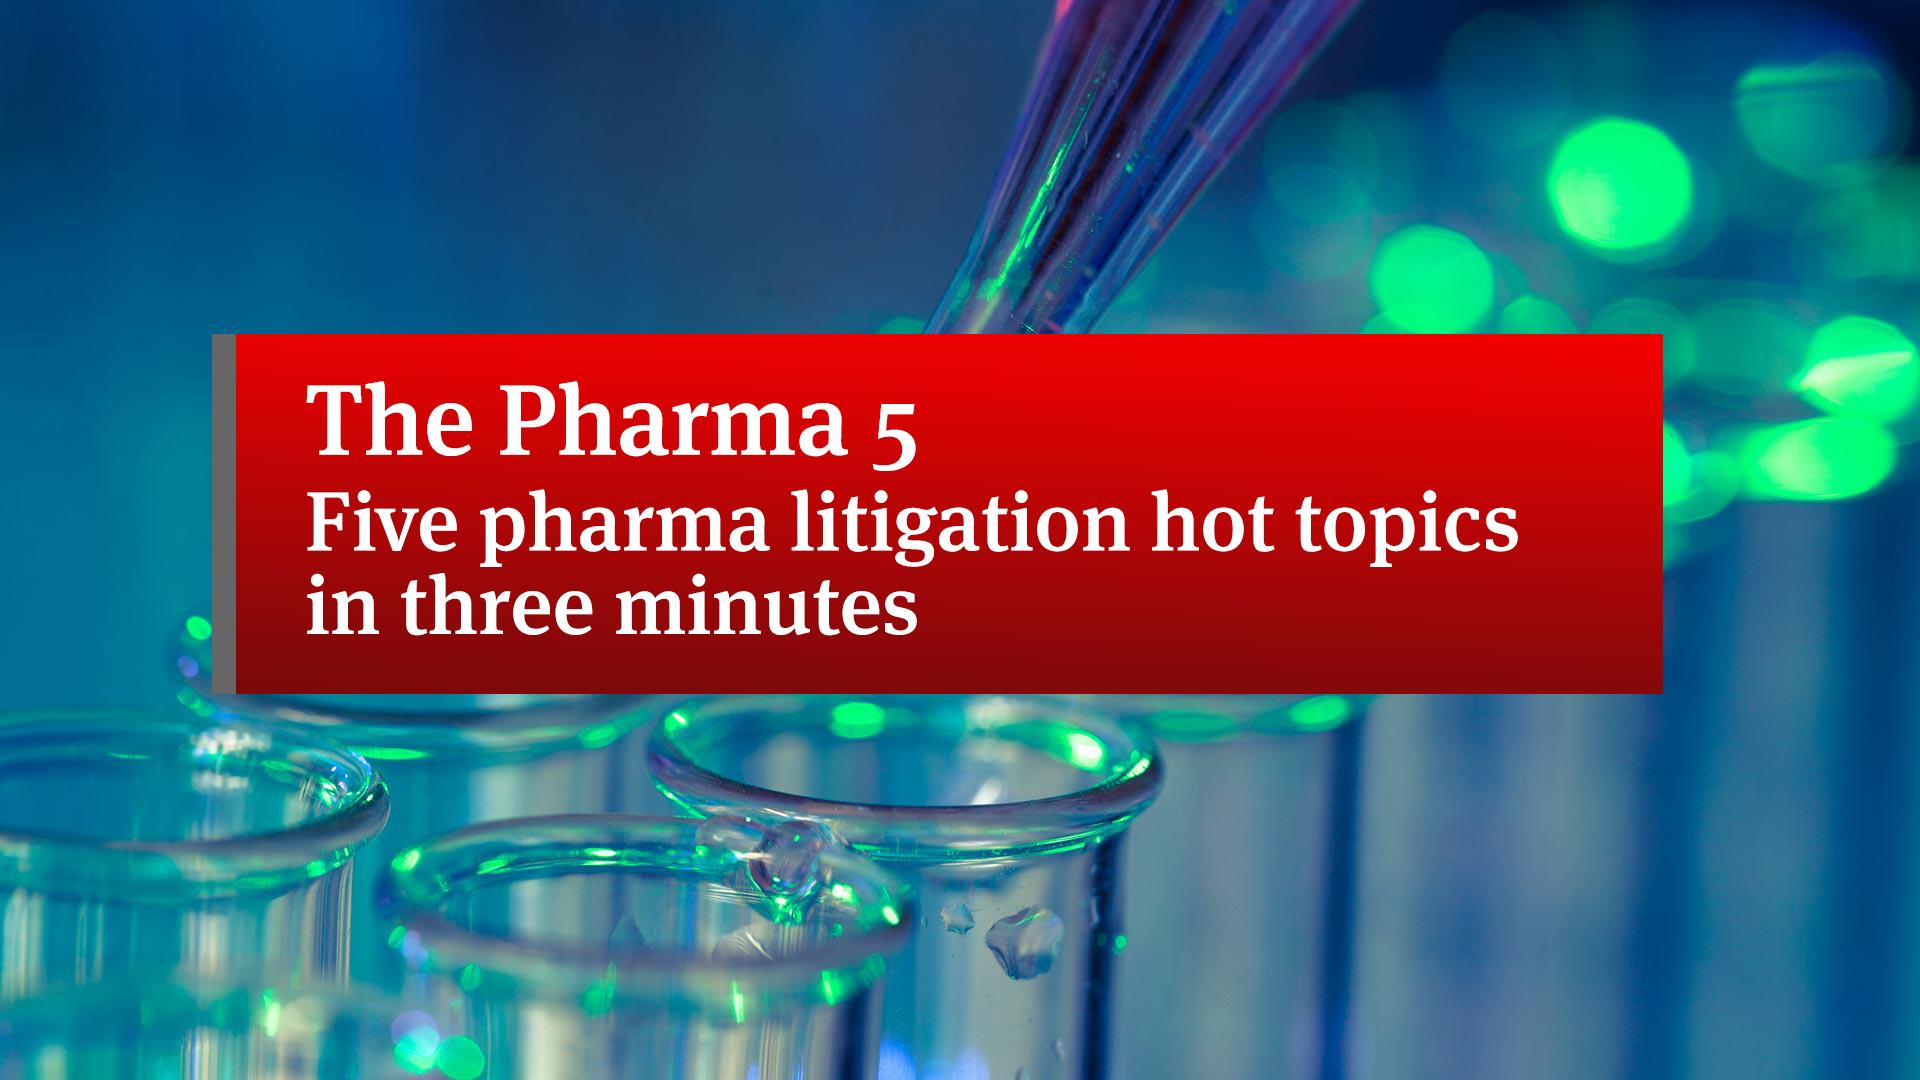 The Pharma 5 | Five pharma litigation hot topics in three minutes